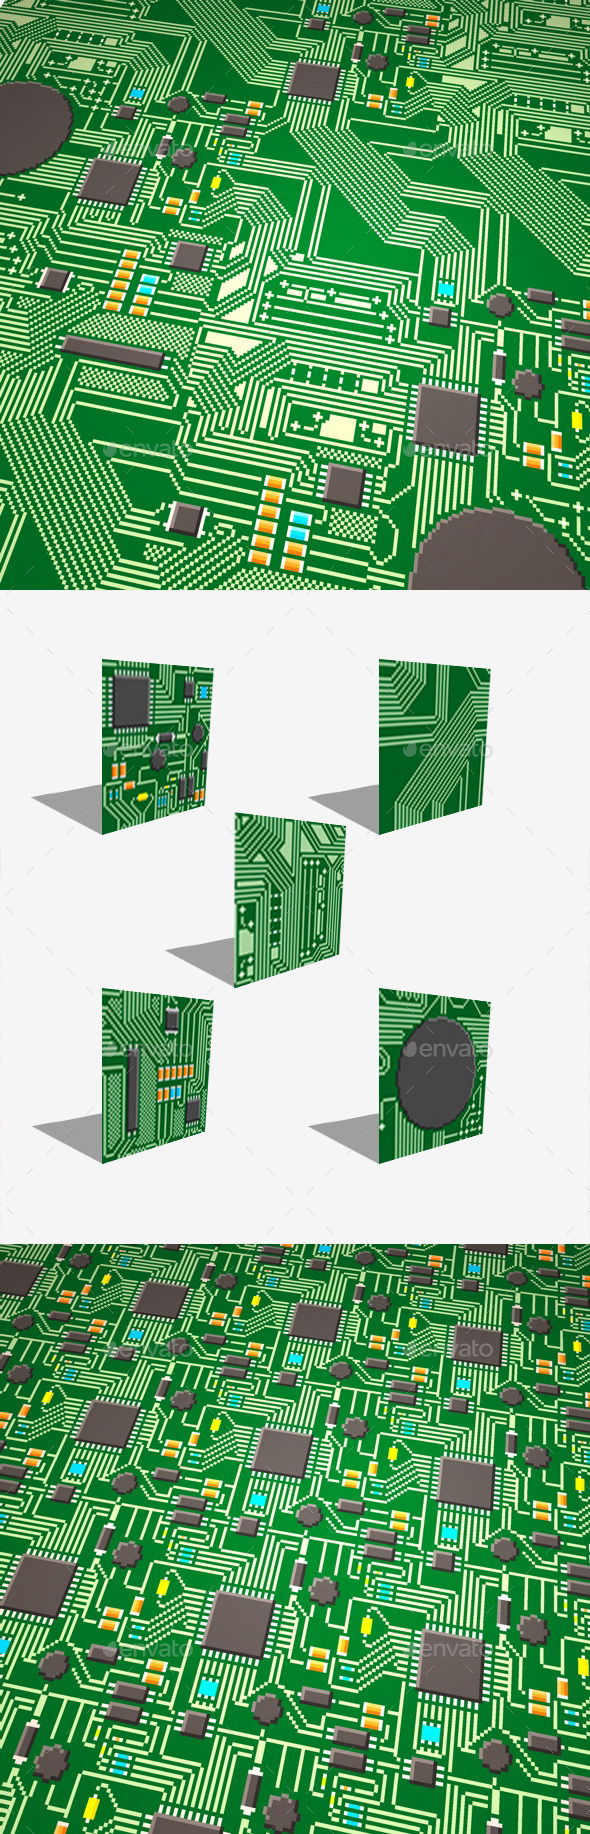 GraphicRiver 5 Circuit Board Pixel Seamless Modular Textures 11893497